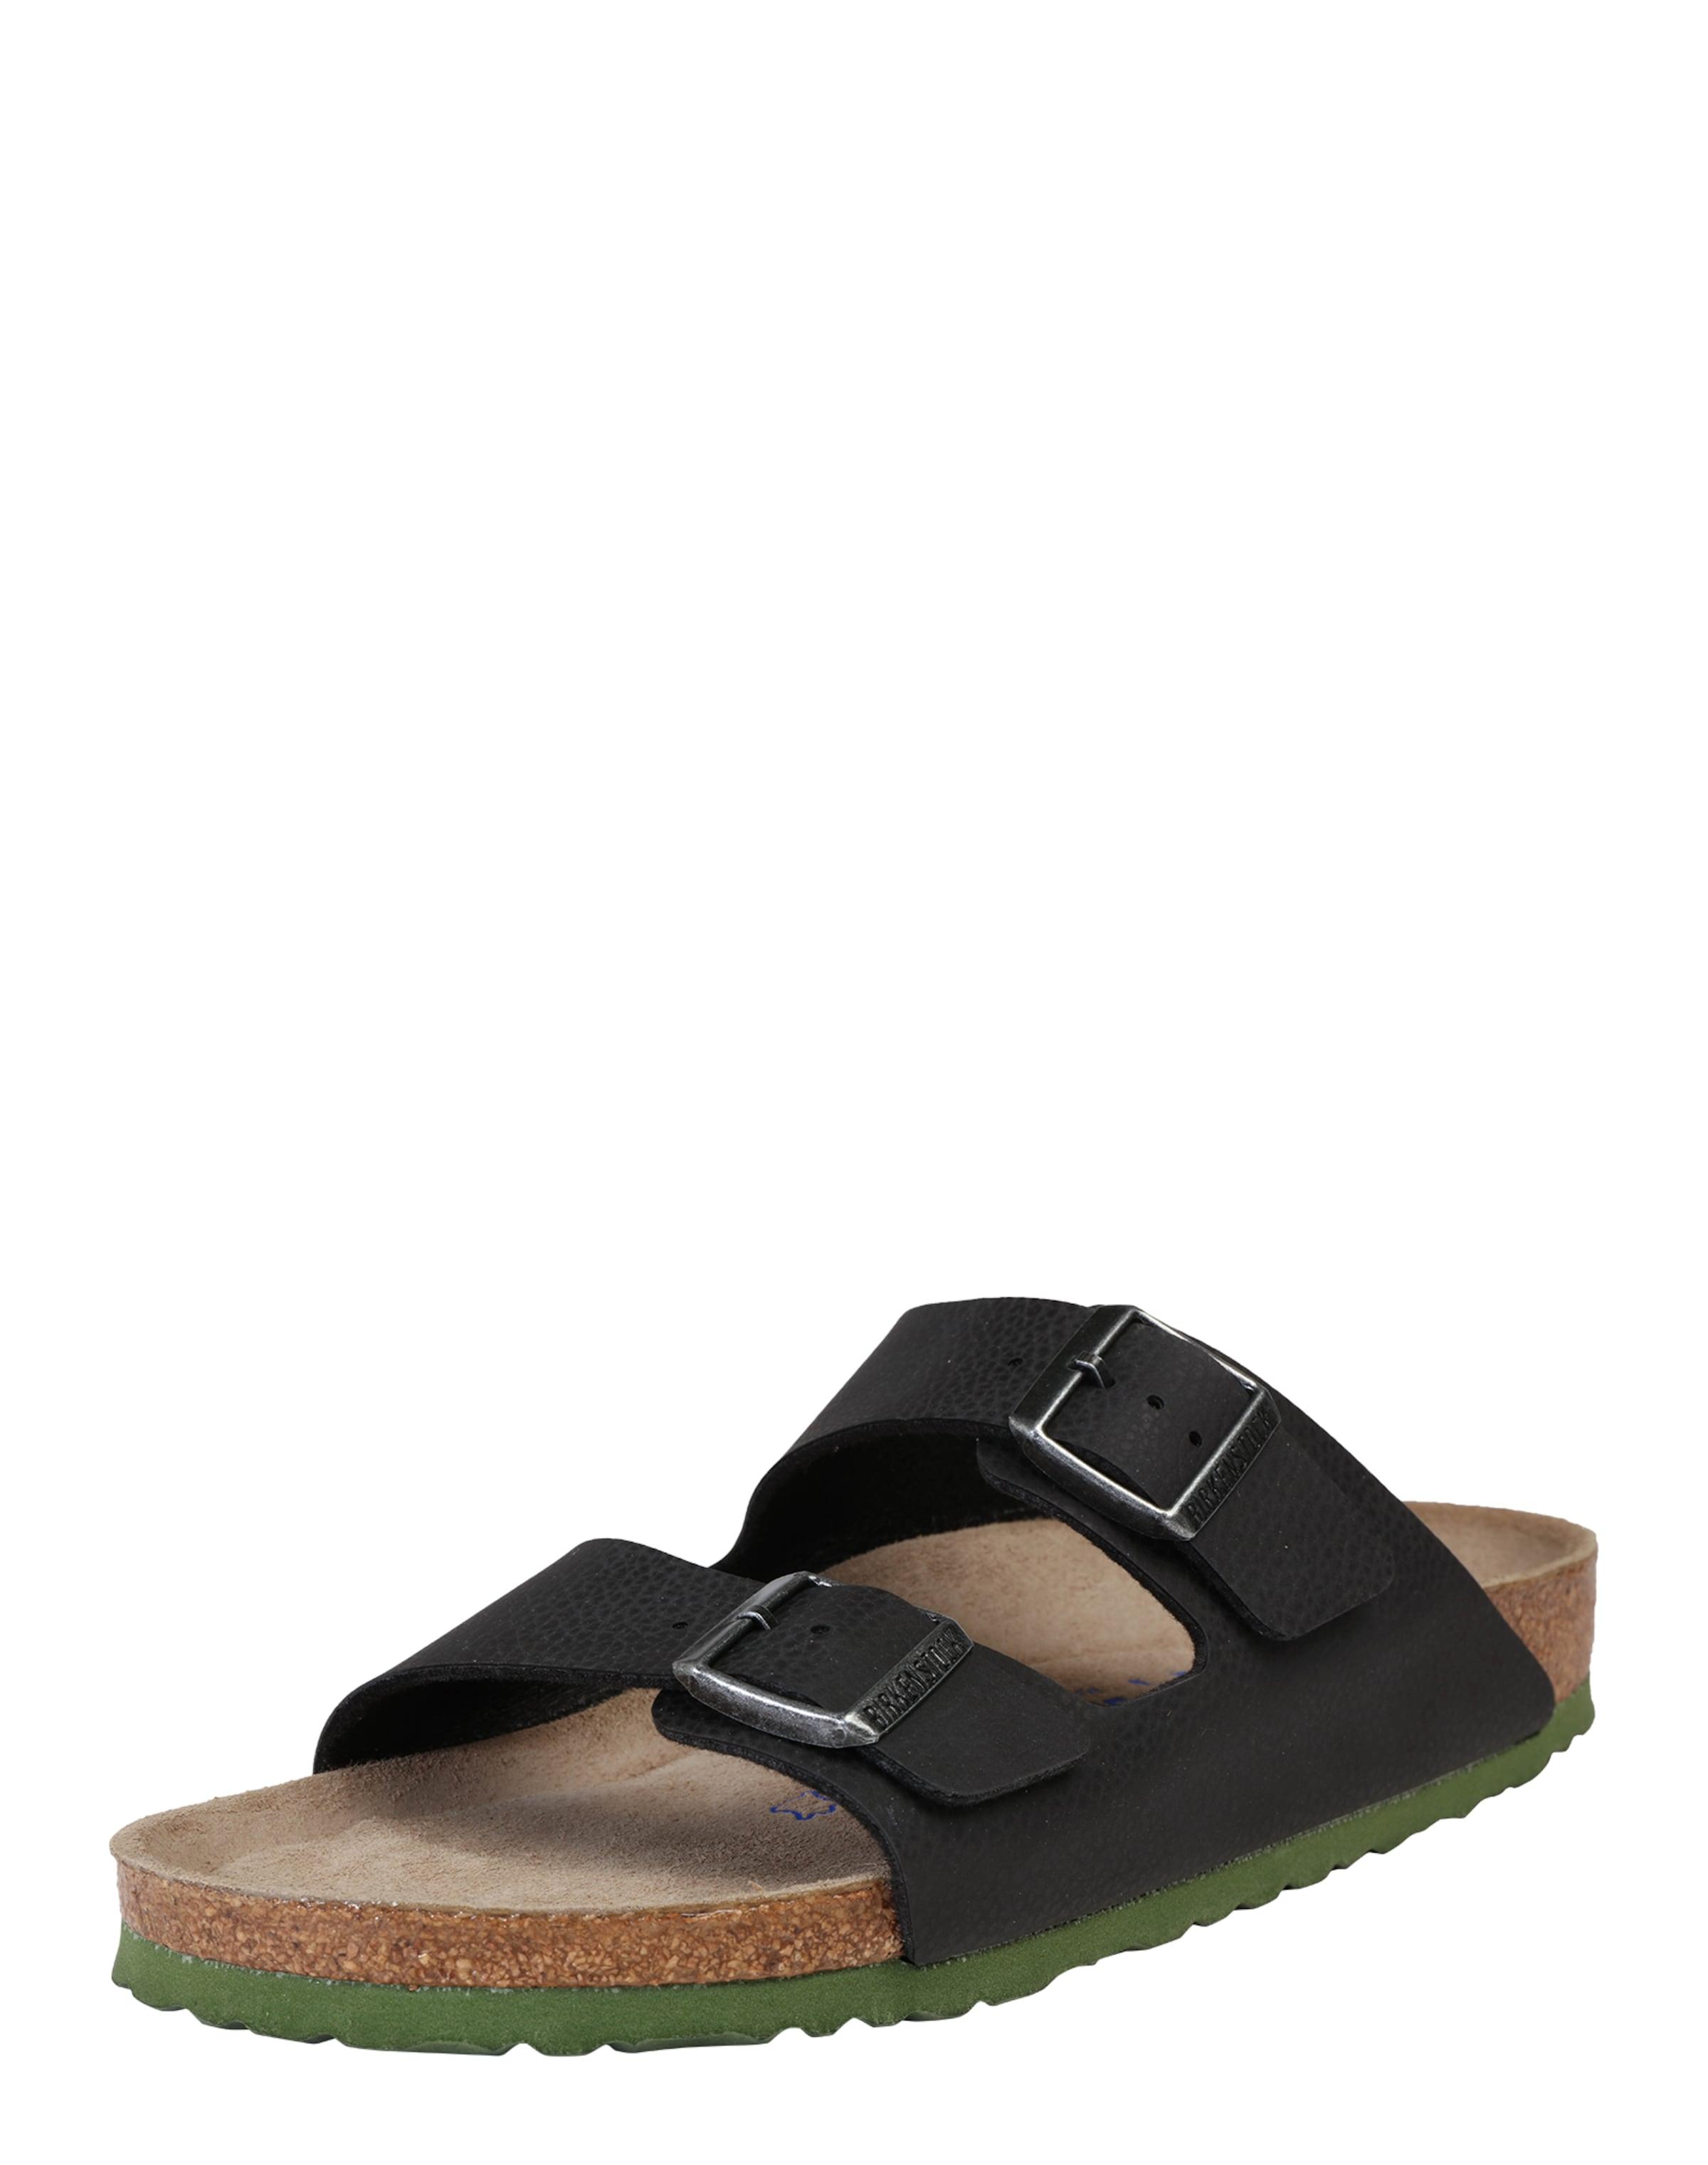 BIRKENSTOCK Sandale Arizona Arizona Arizona Verschleißfeste billige Schuhe 5244a9